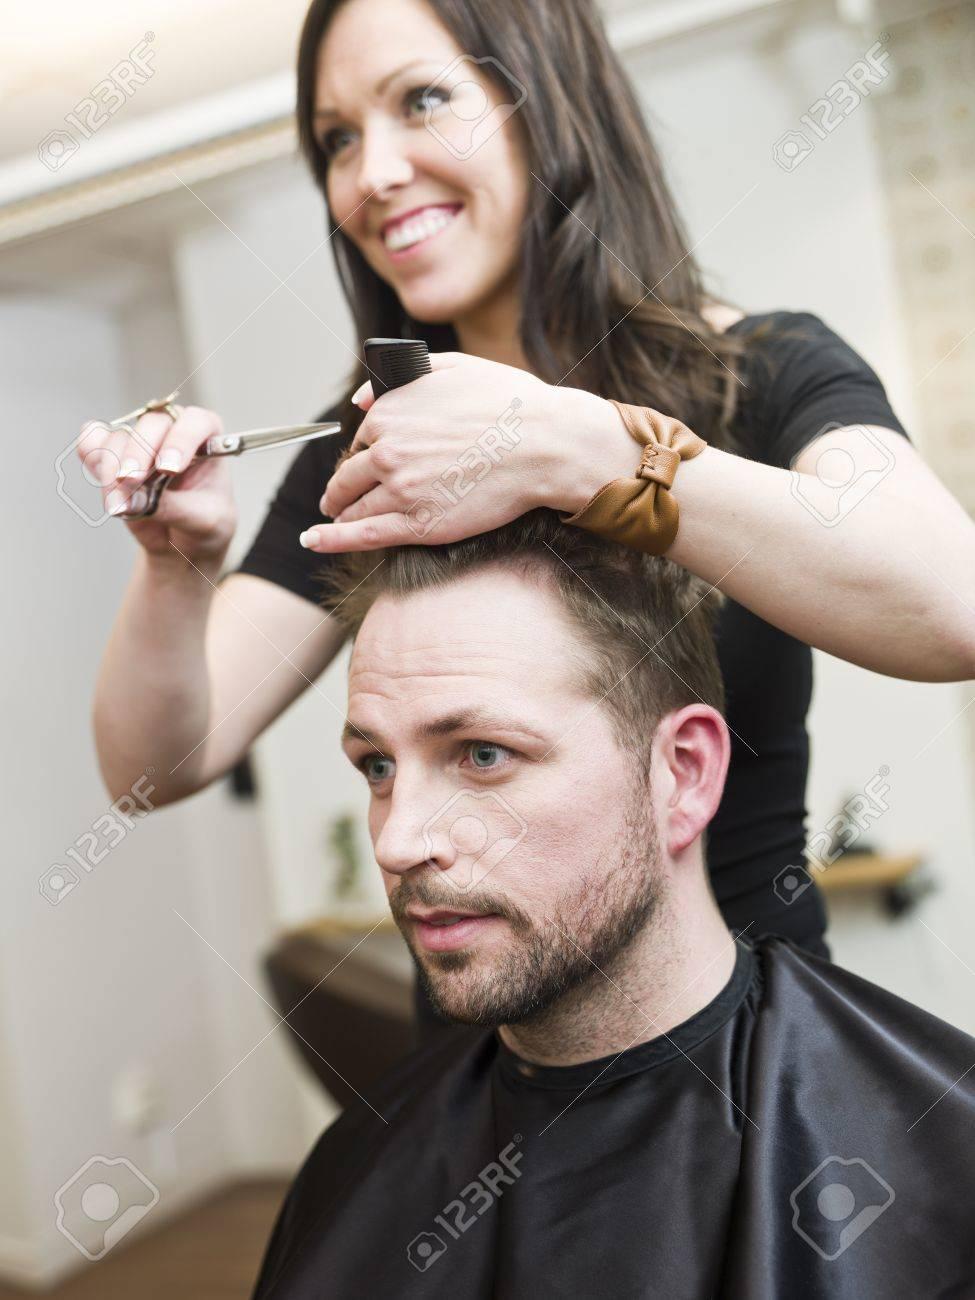 Man at the Hair salon situation Stock Photo - 9289562